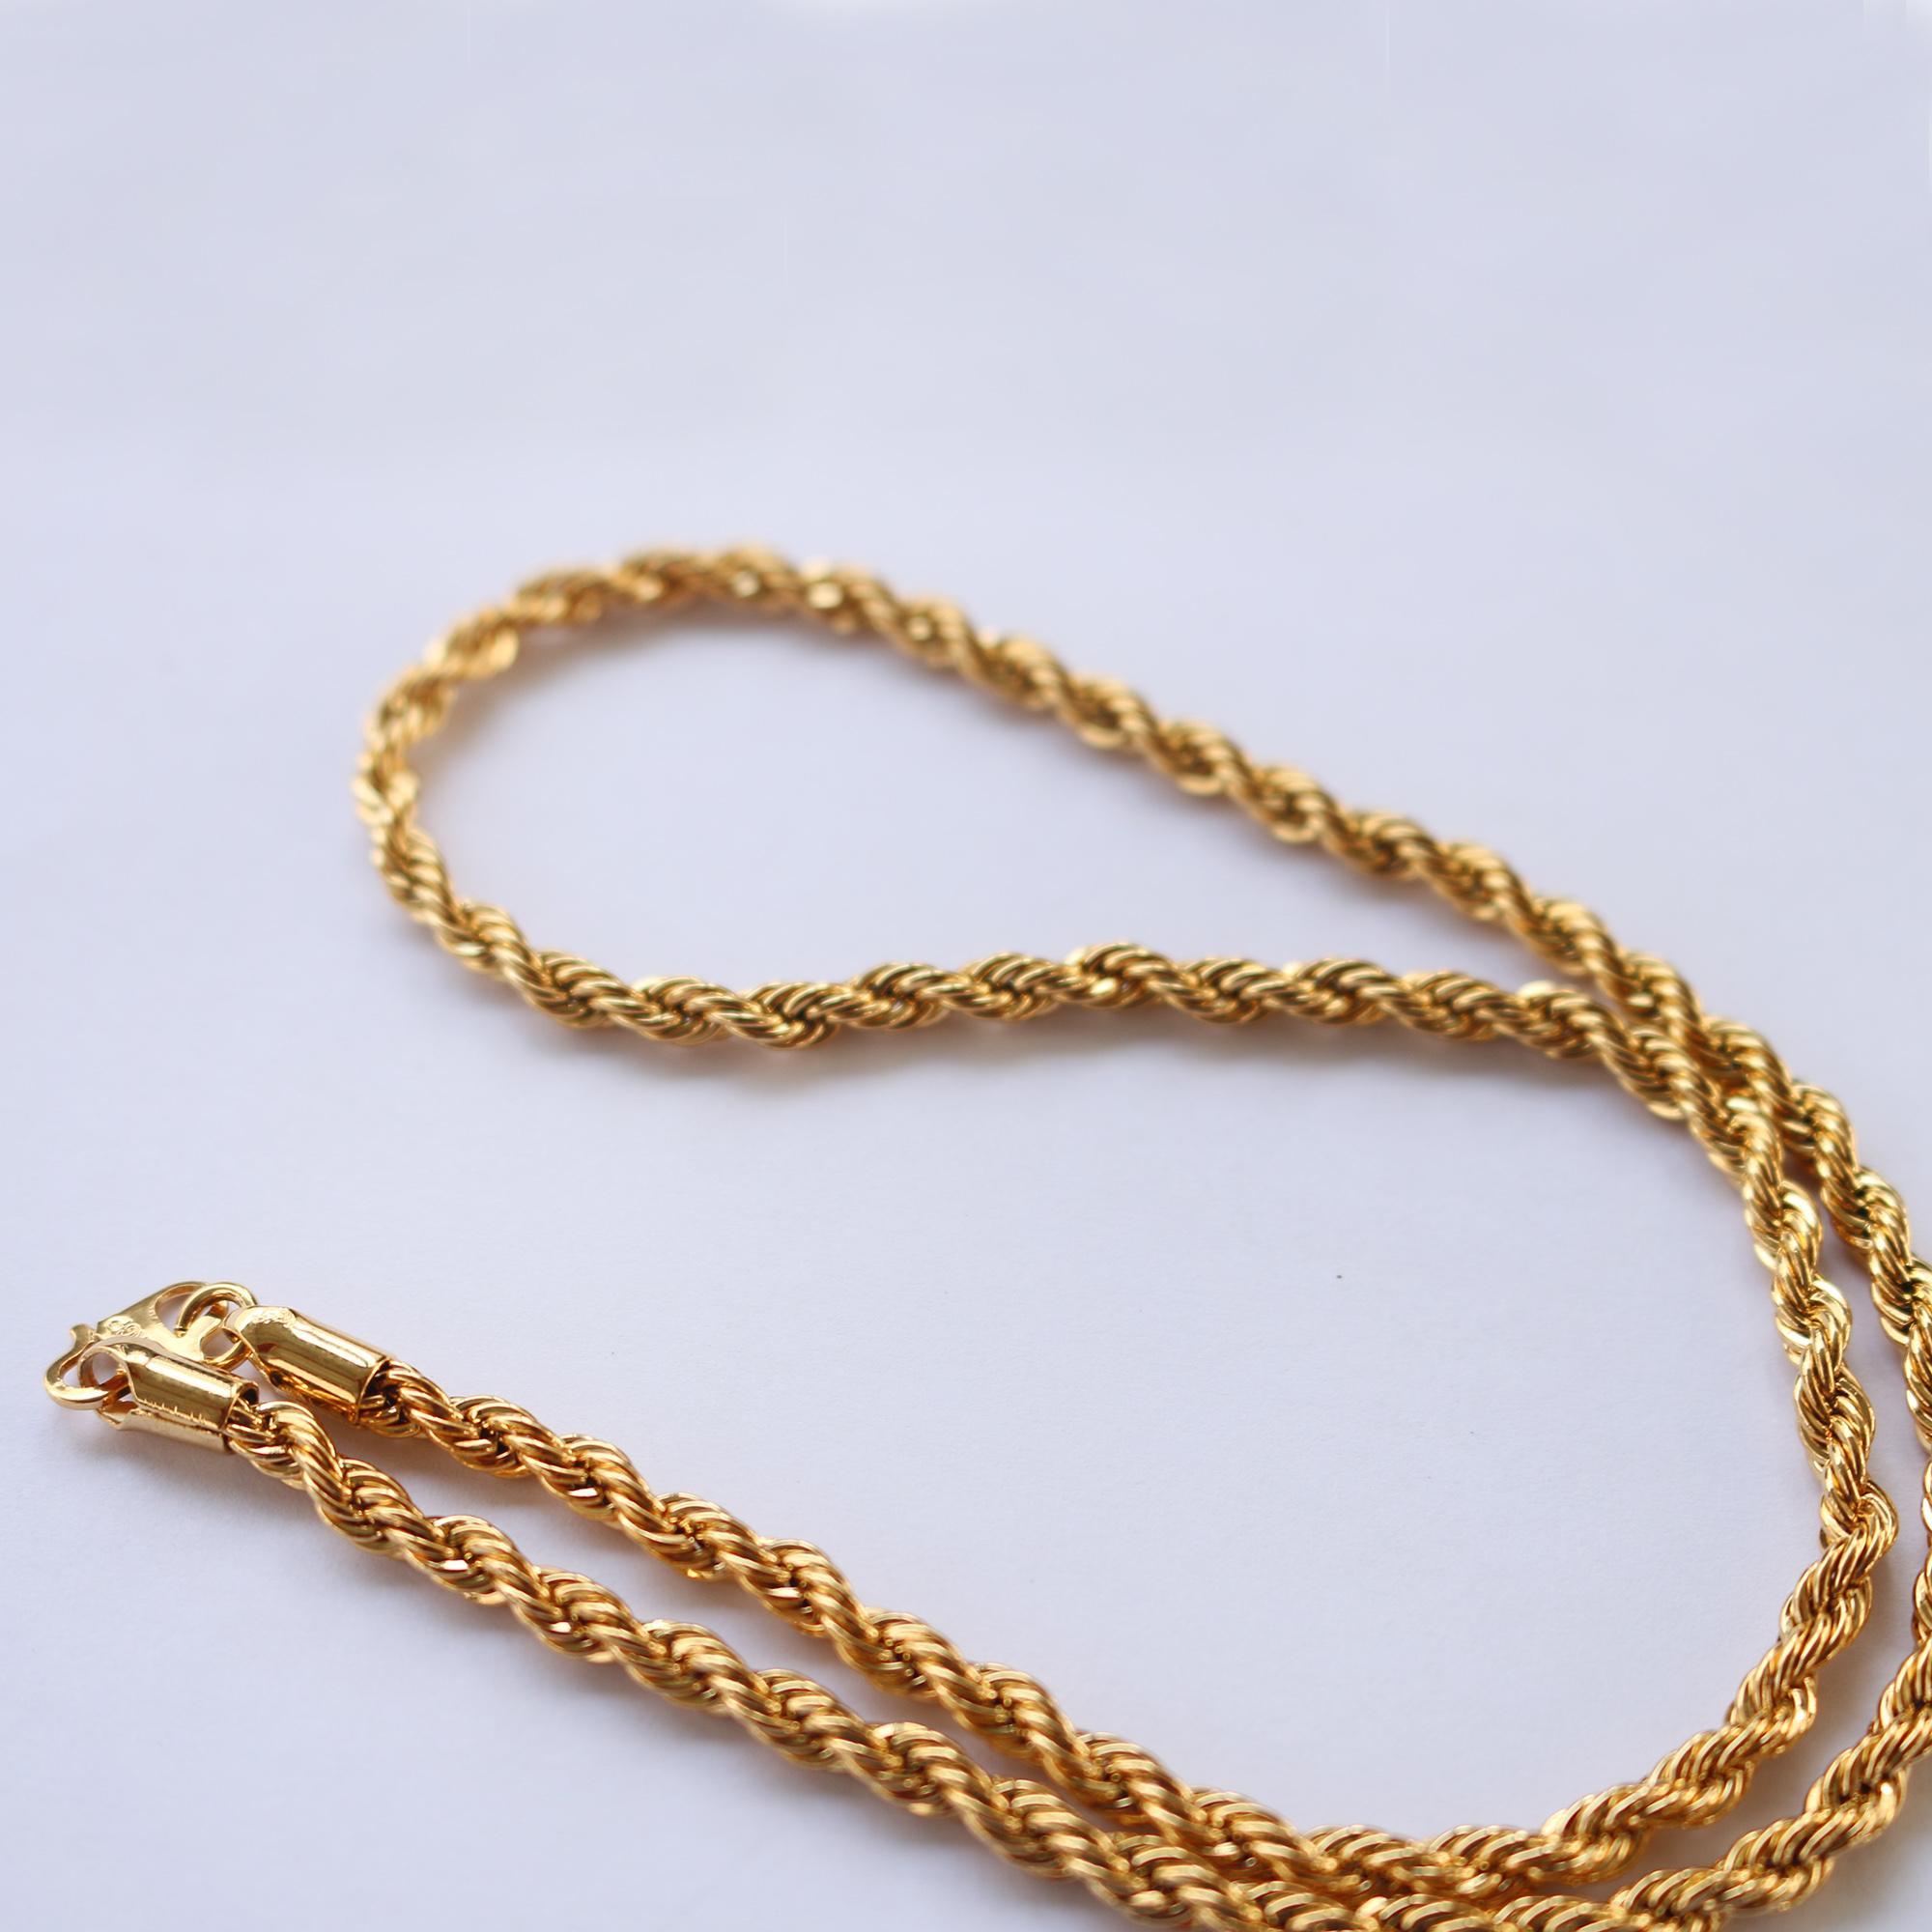 Kalung Tambang Besar 45cm Lapis Emas Xuping Warna 24k Perhiasan Cantik Menawan